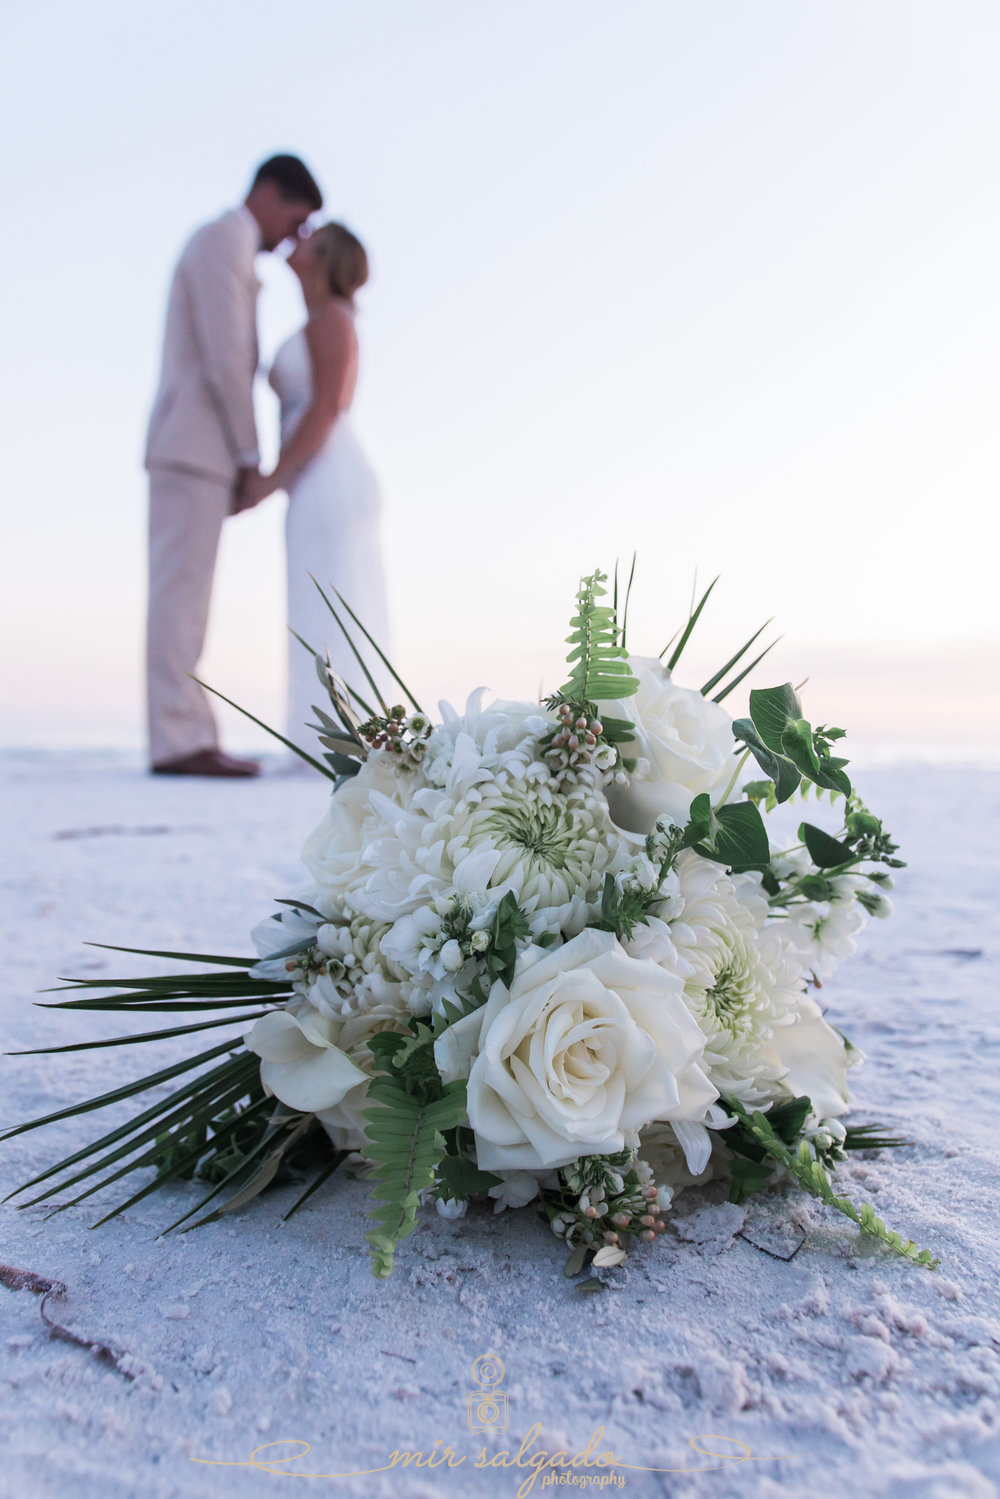 wedding-photo-blurred-background-gorgeous-bride-groom-blurry